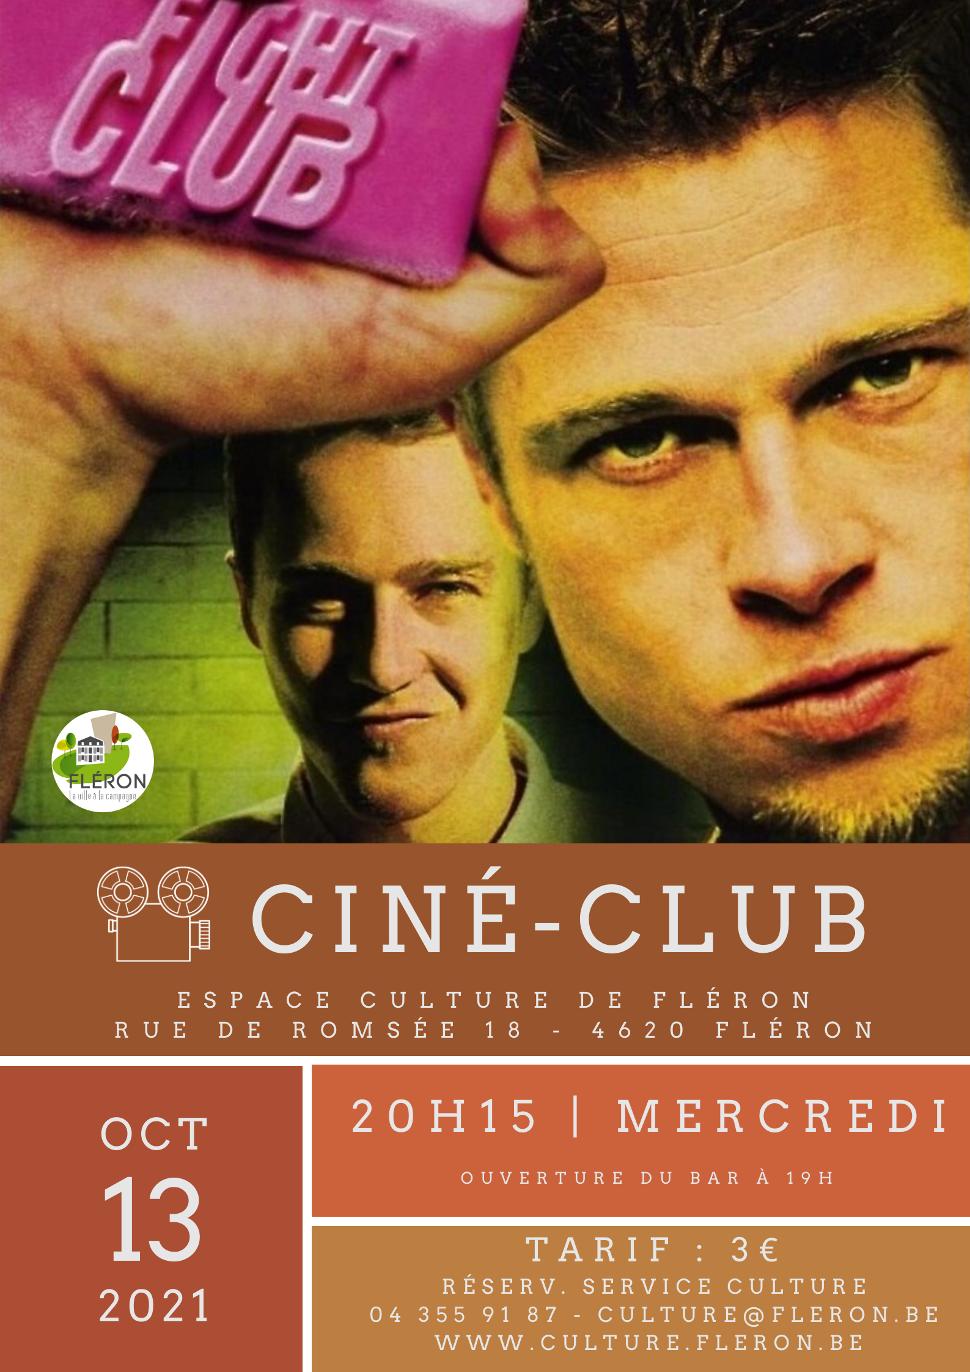 CINÉ-CLUB Fight Club